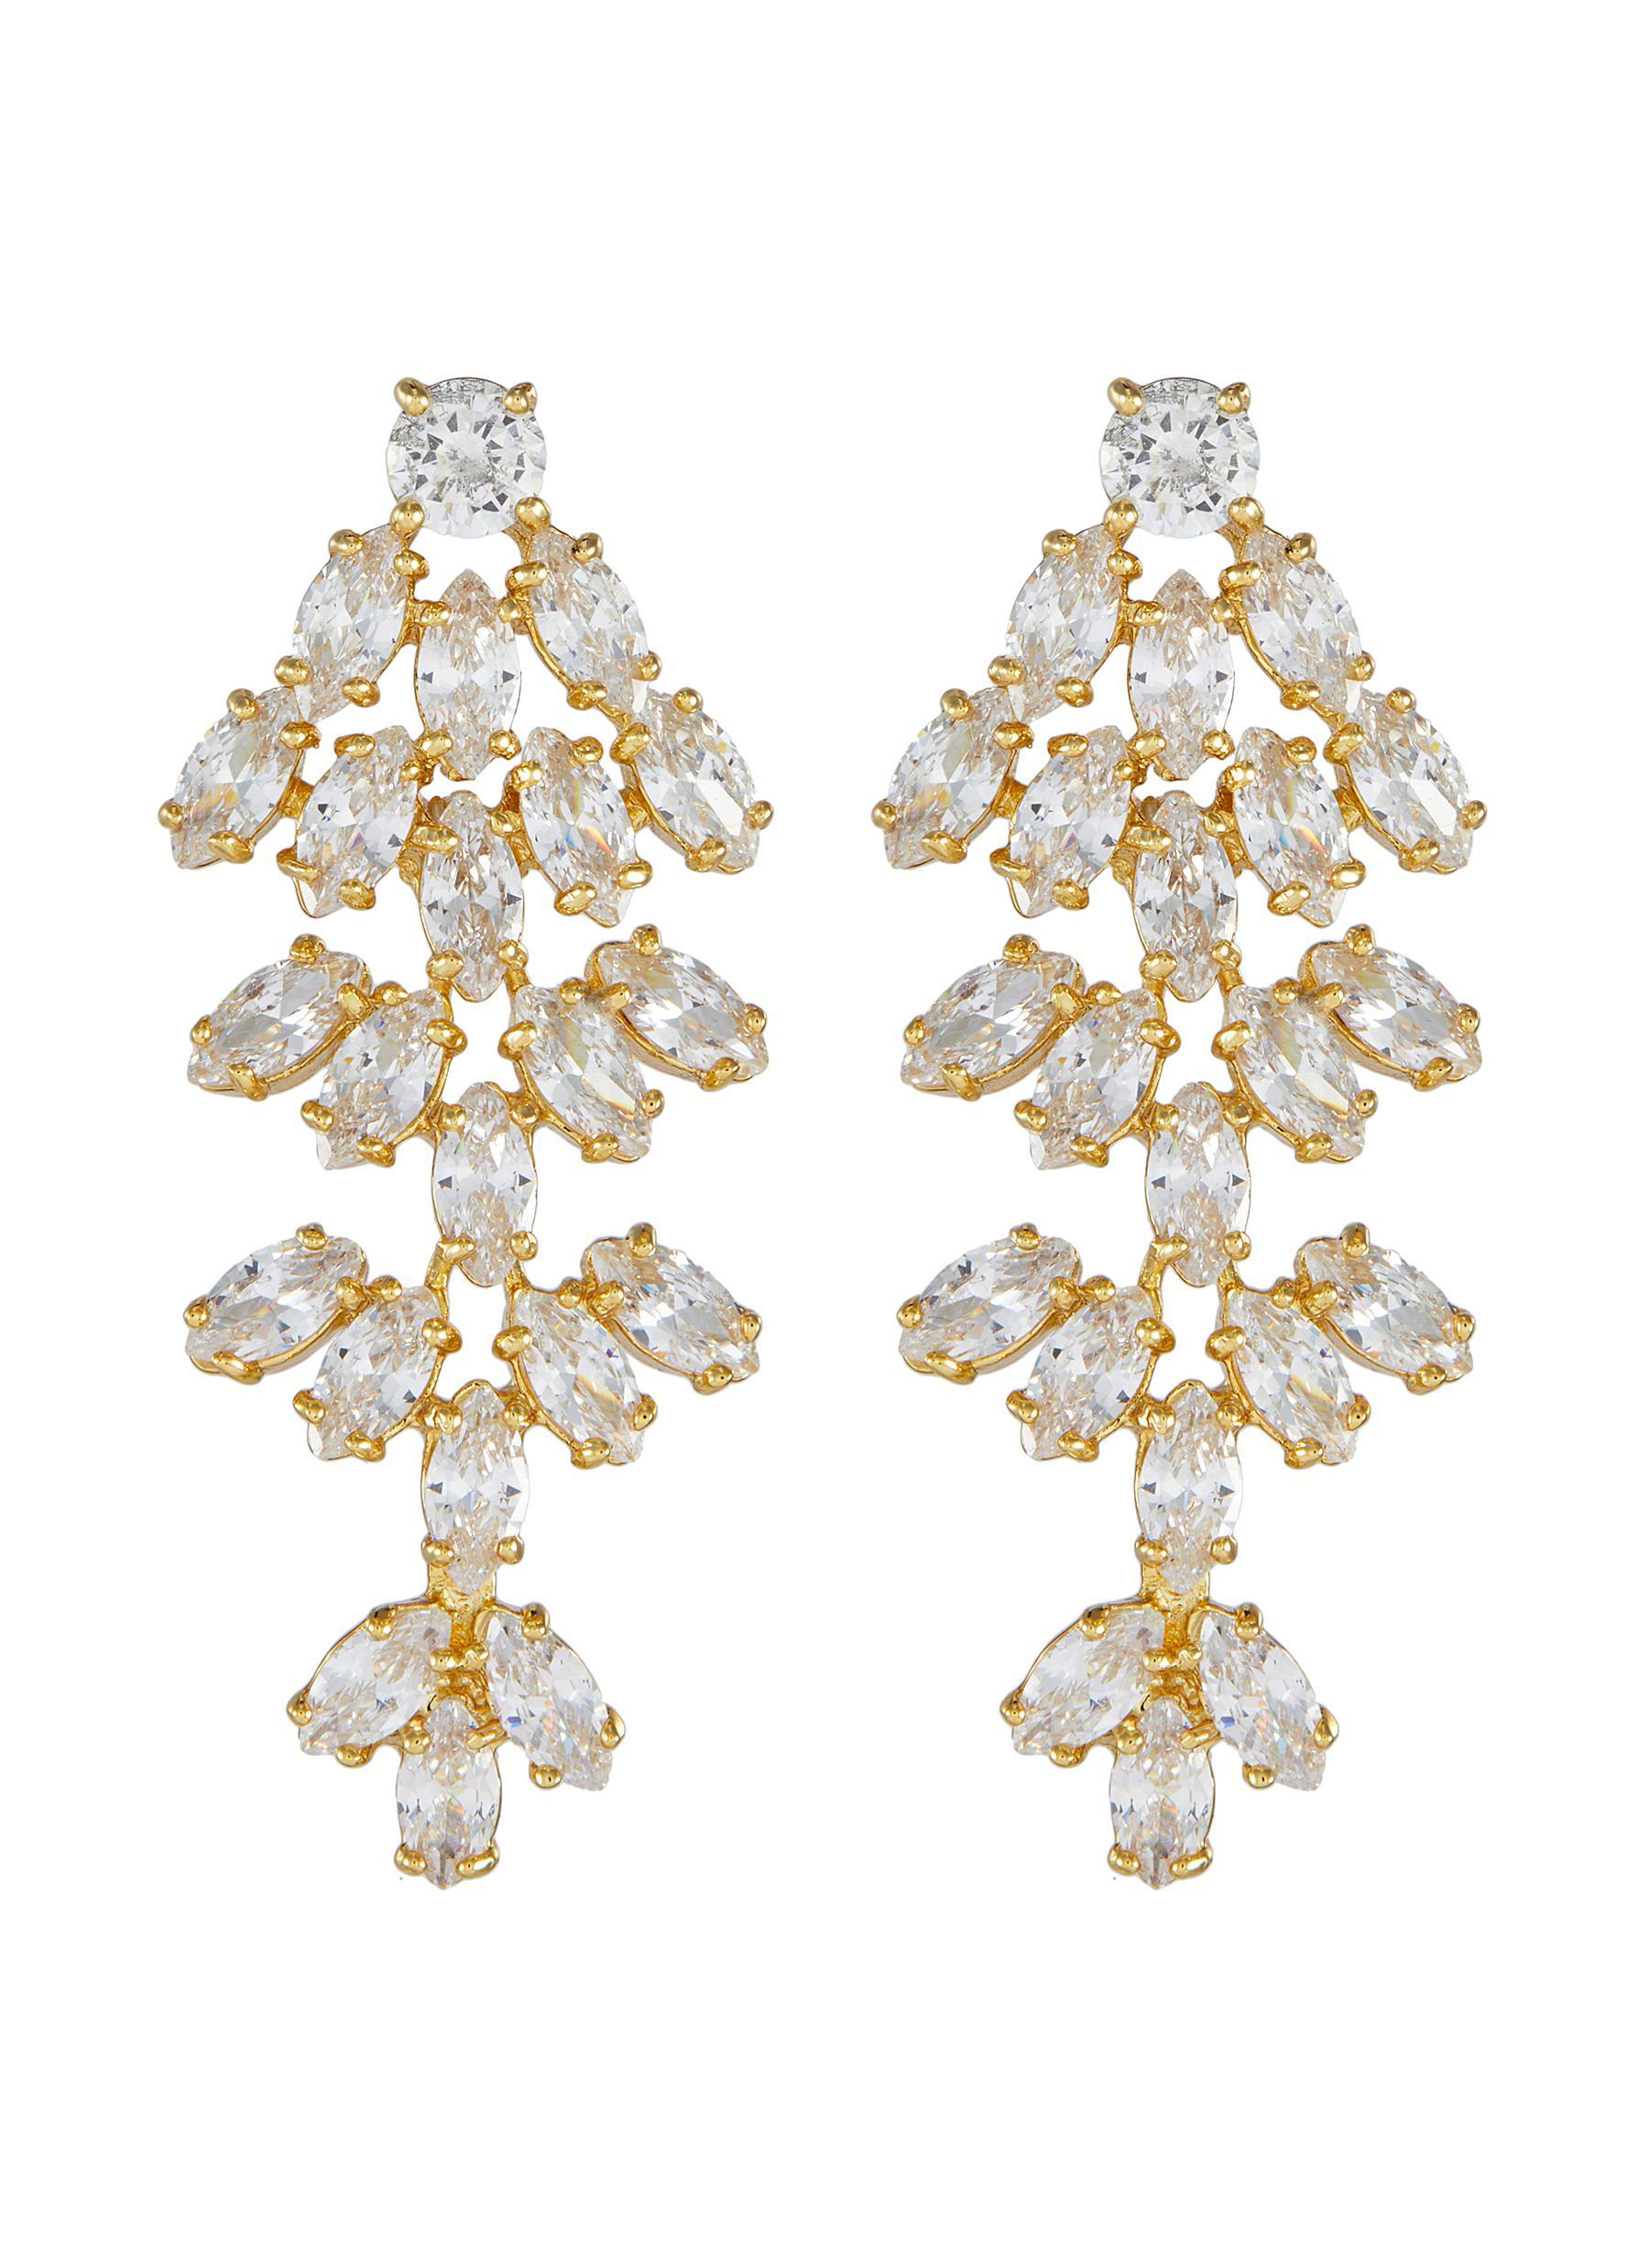 Cluster leaf cubic zirconia statement earrings